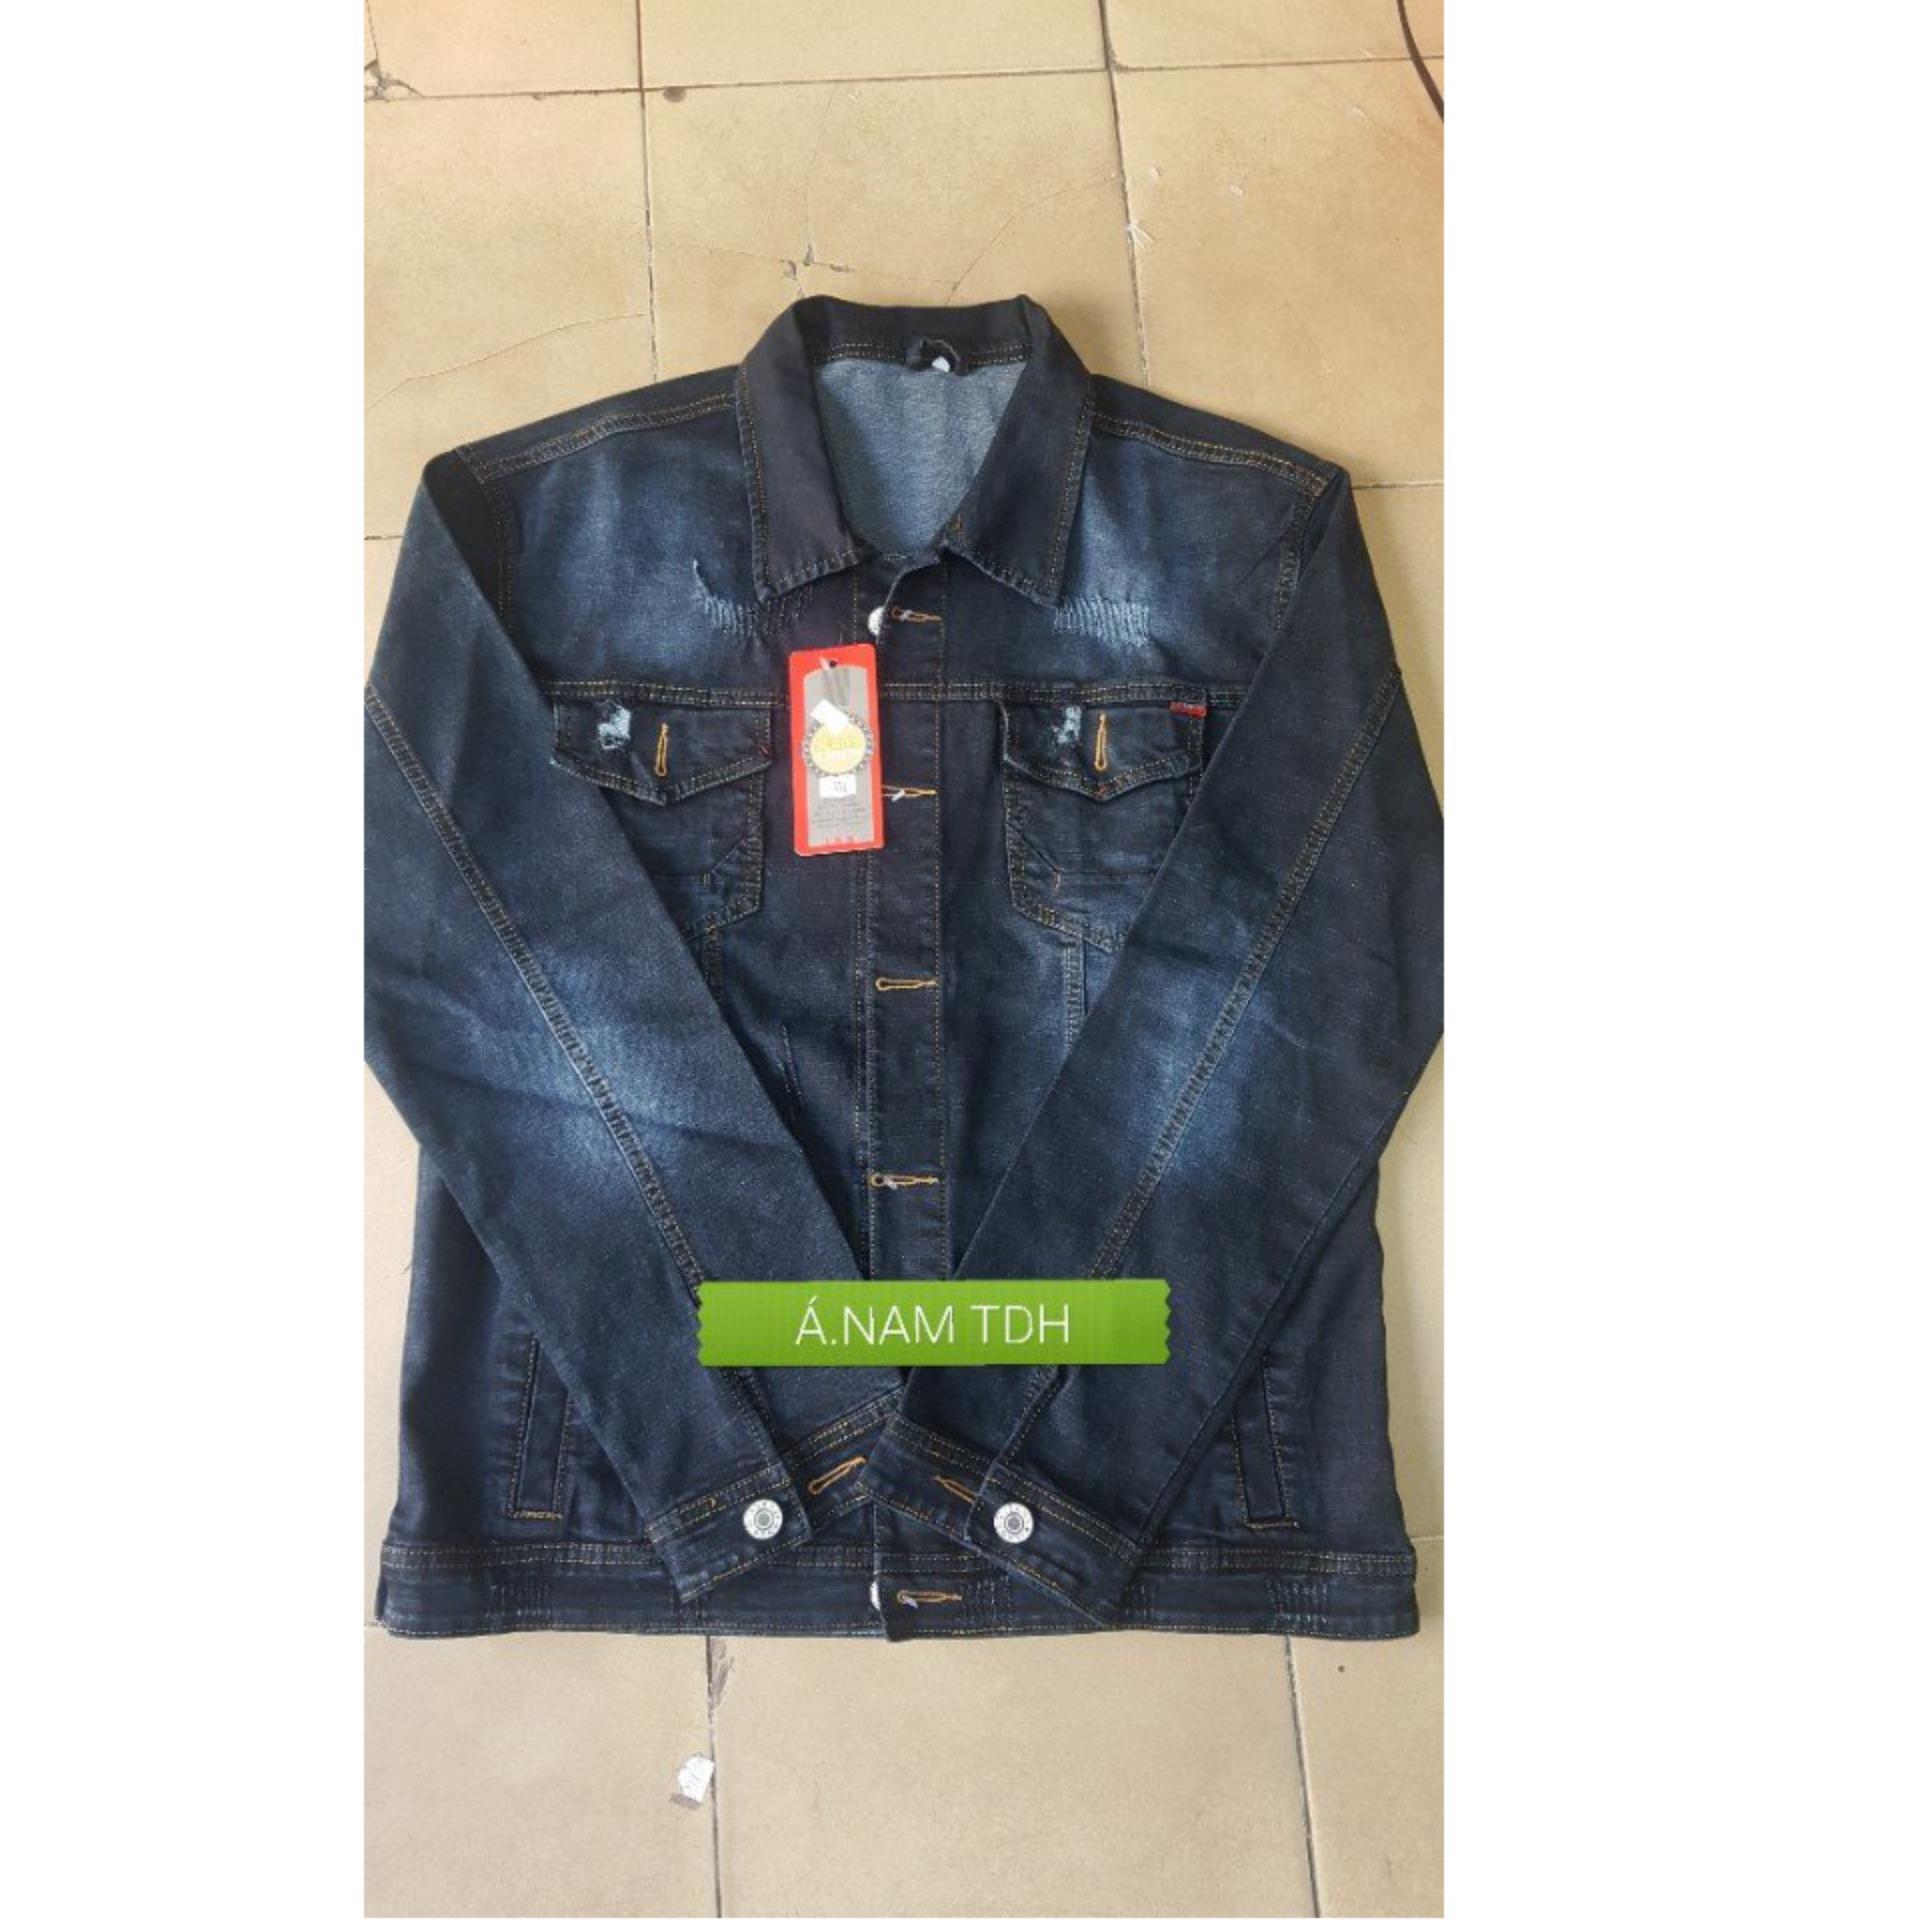 Áo Khoác Jeans Nam Co Giãn - Denim Jacket 001 ( Xanh Đậm)